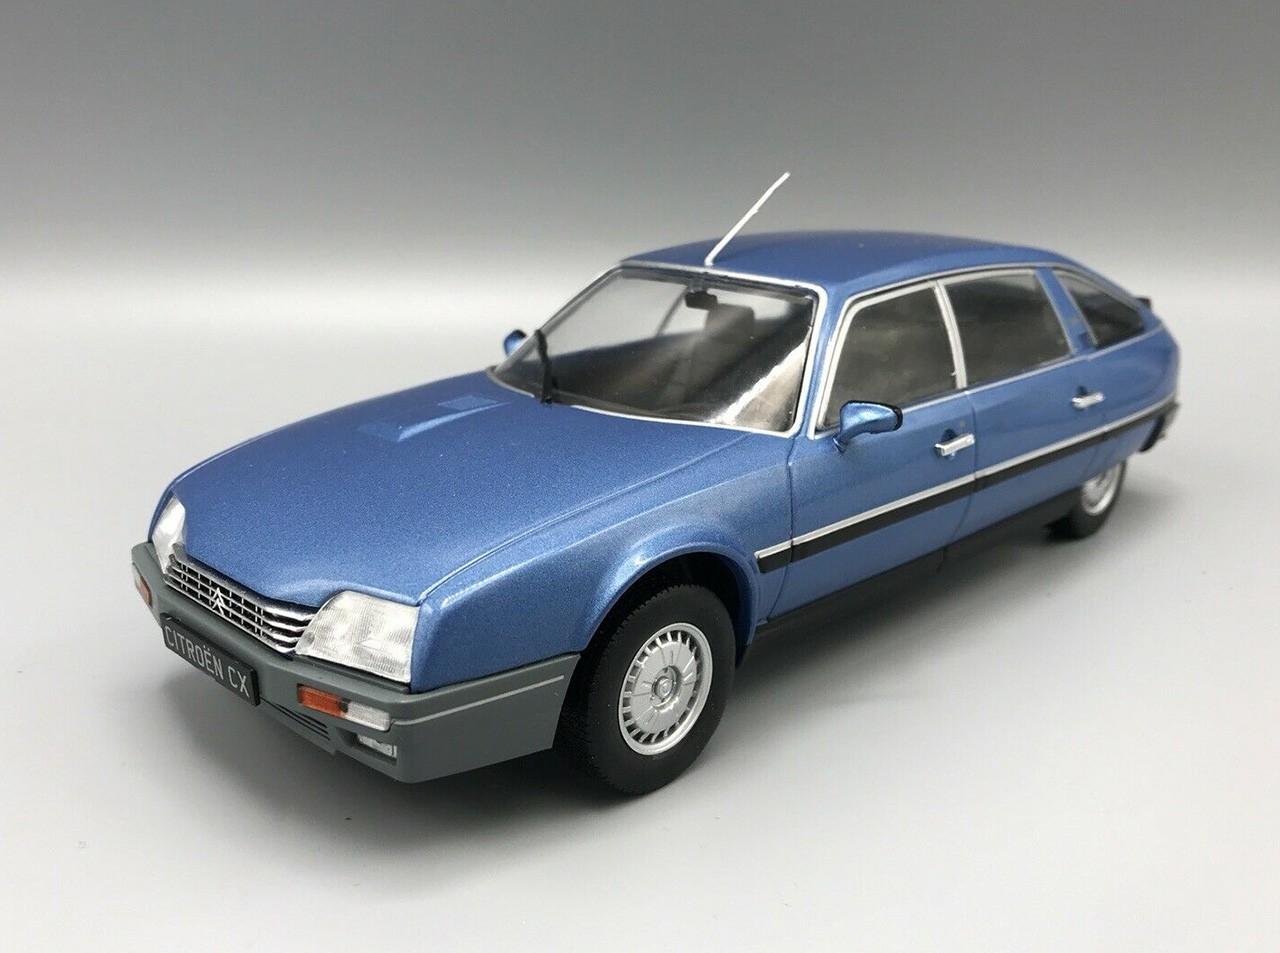 Citroen Cx 2500 Blau 1986 1//24 whitebox